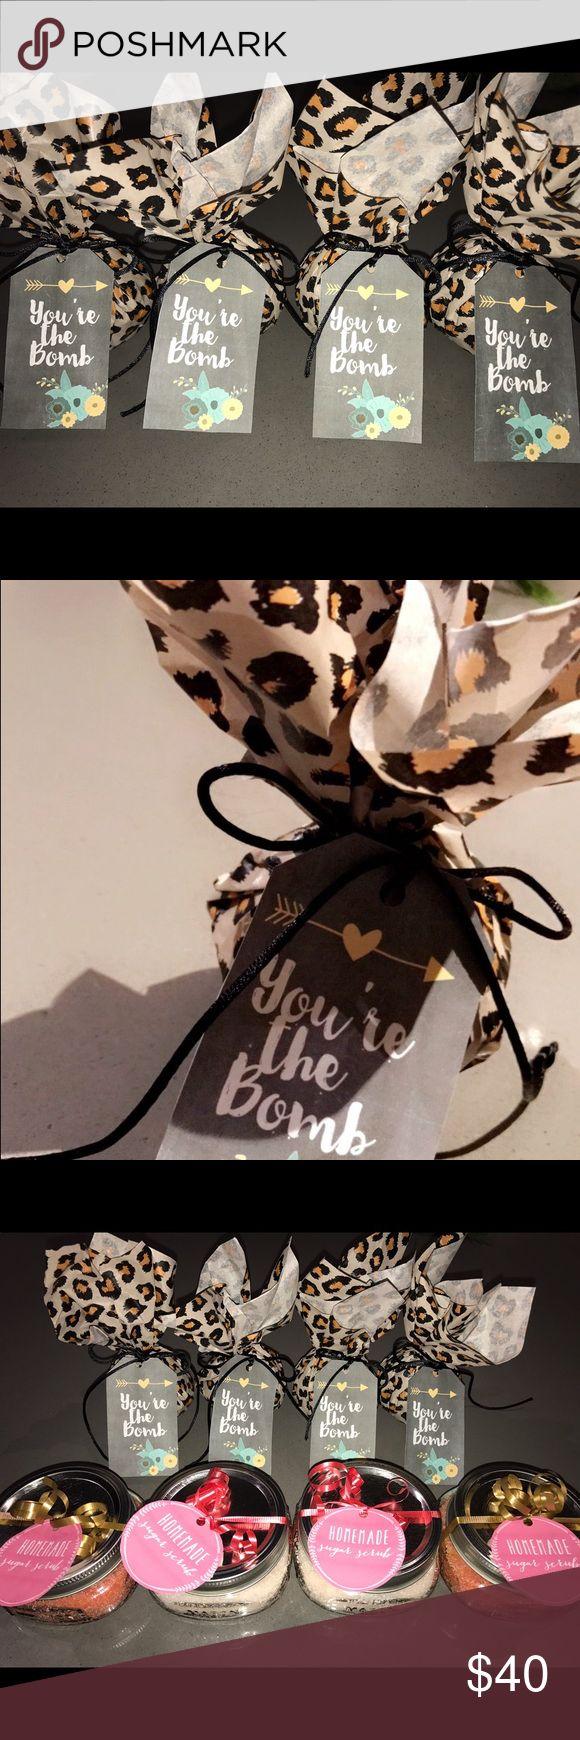 7 best DIY gift for women images on Pinterest | Surprise box ...